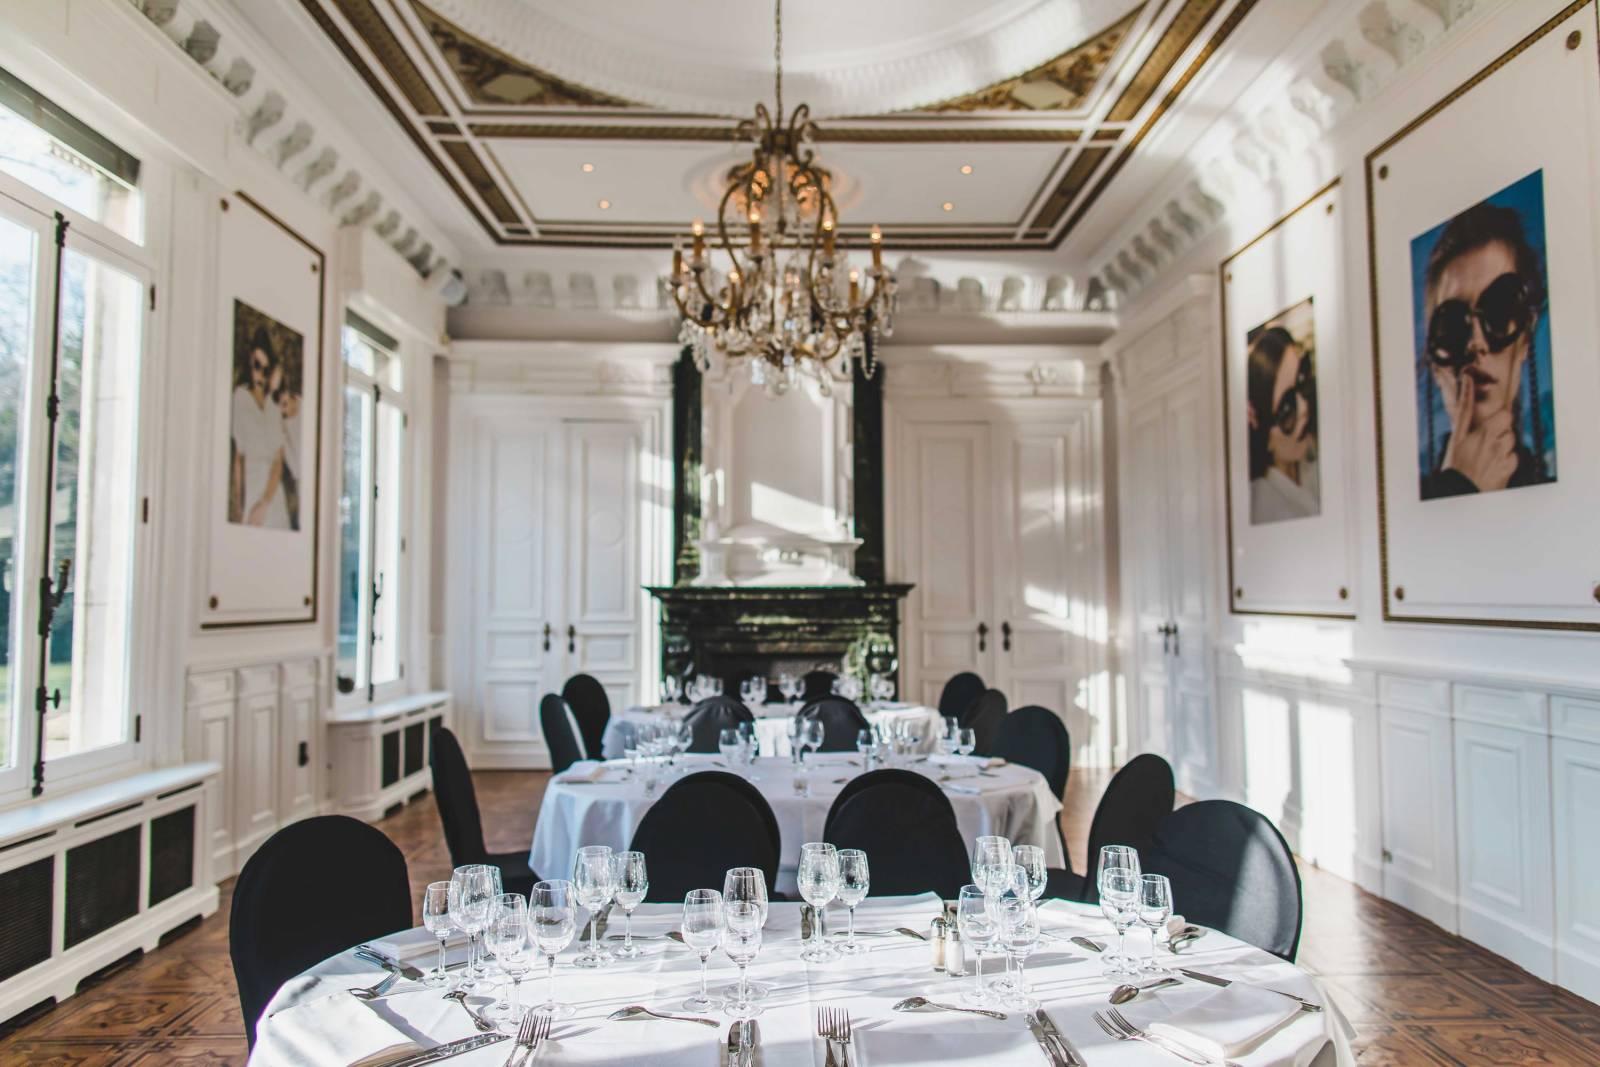 Kasteel Den Brandt - Feestzaal - Trouwzaal - Kasteel - House of Weddings - 32